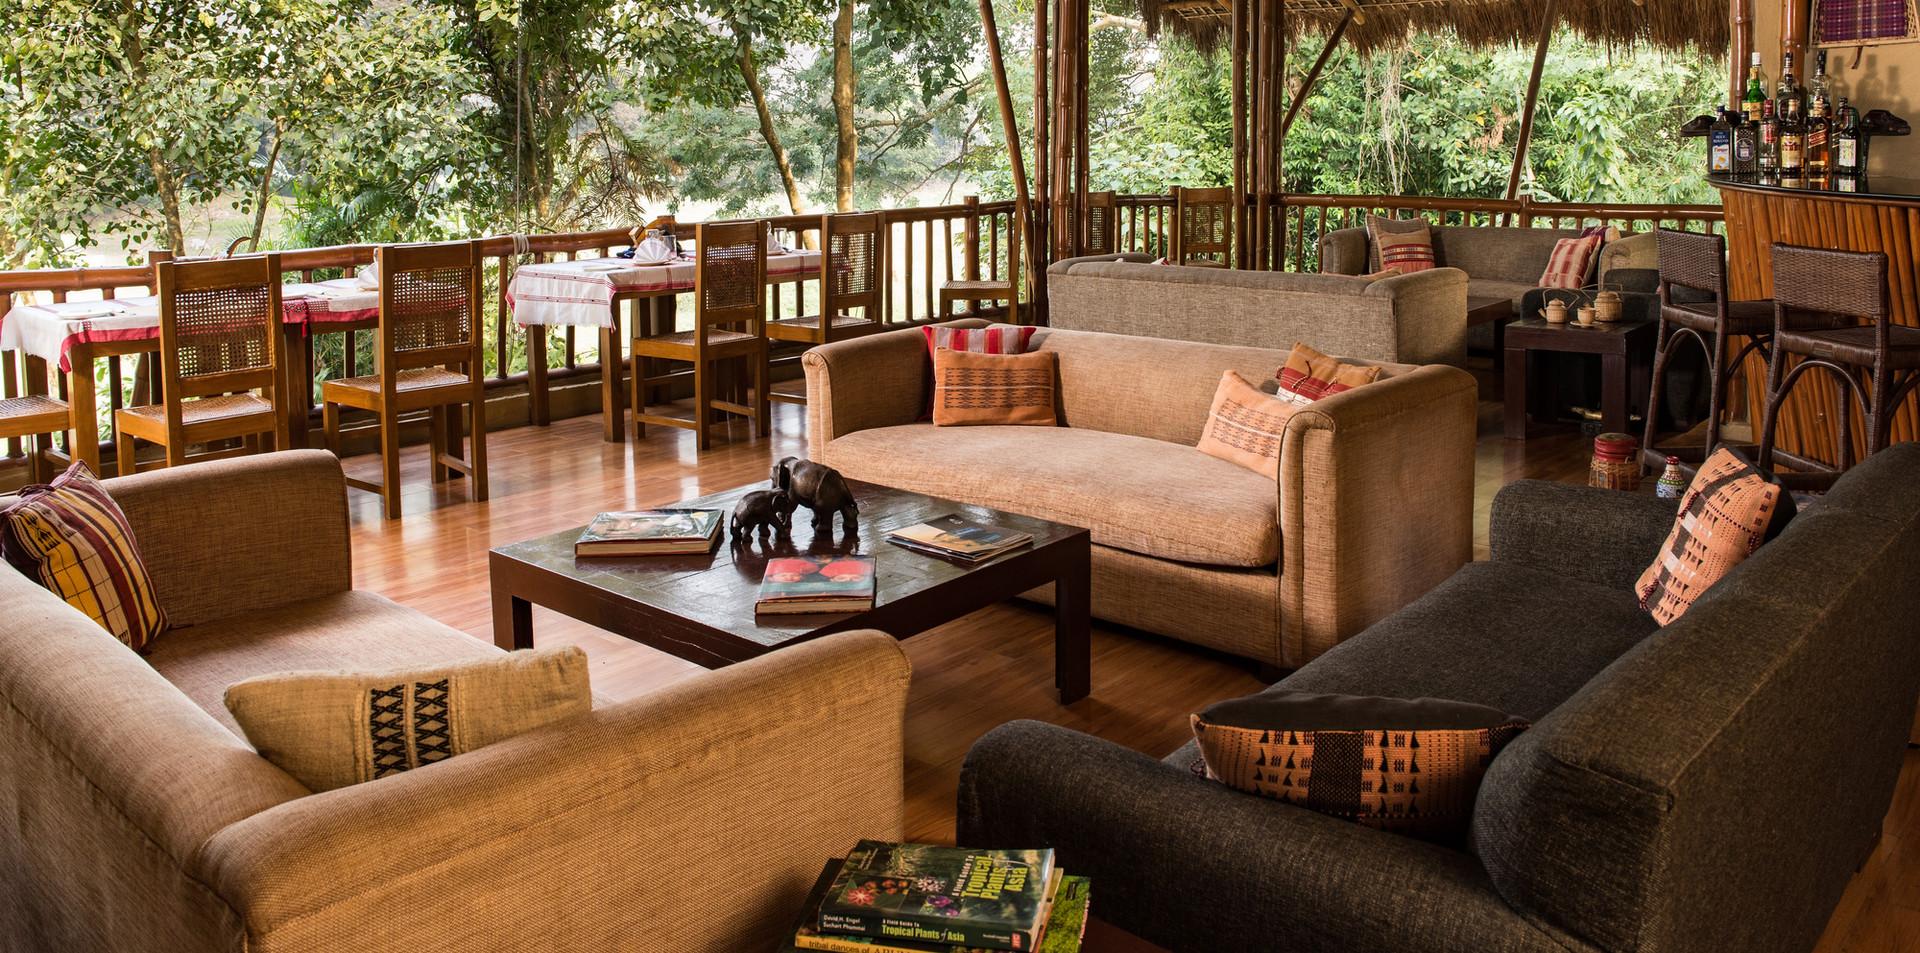 Diphlu River Lodge's Macchan - Dinning A